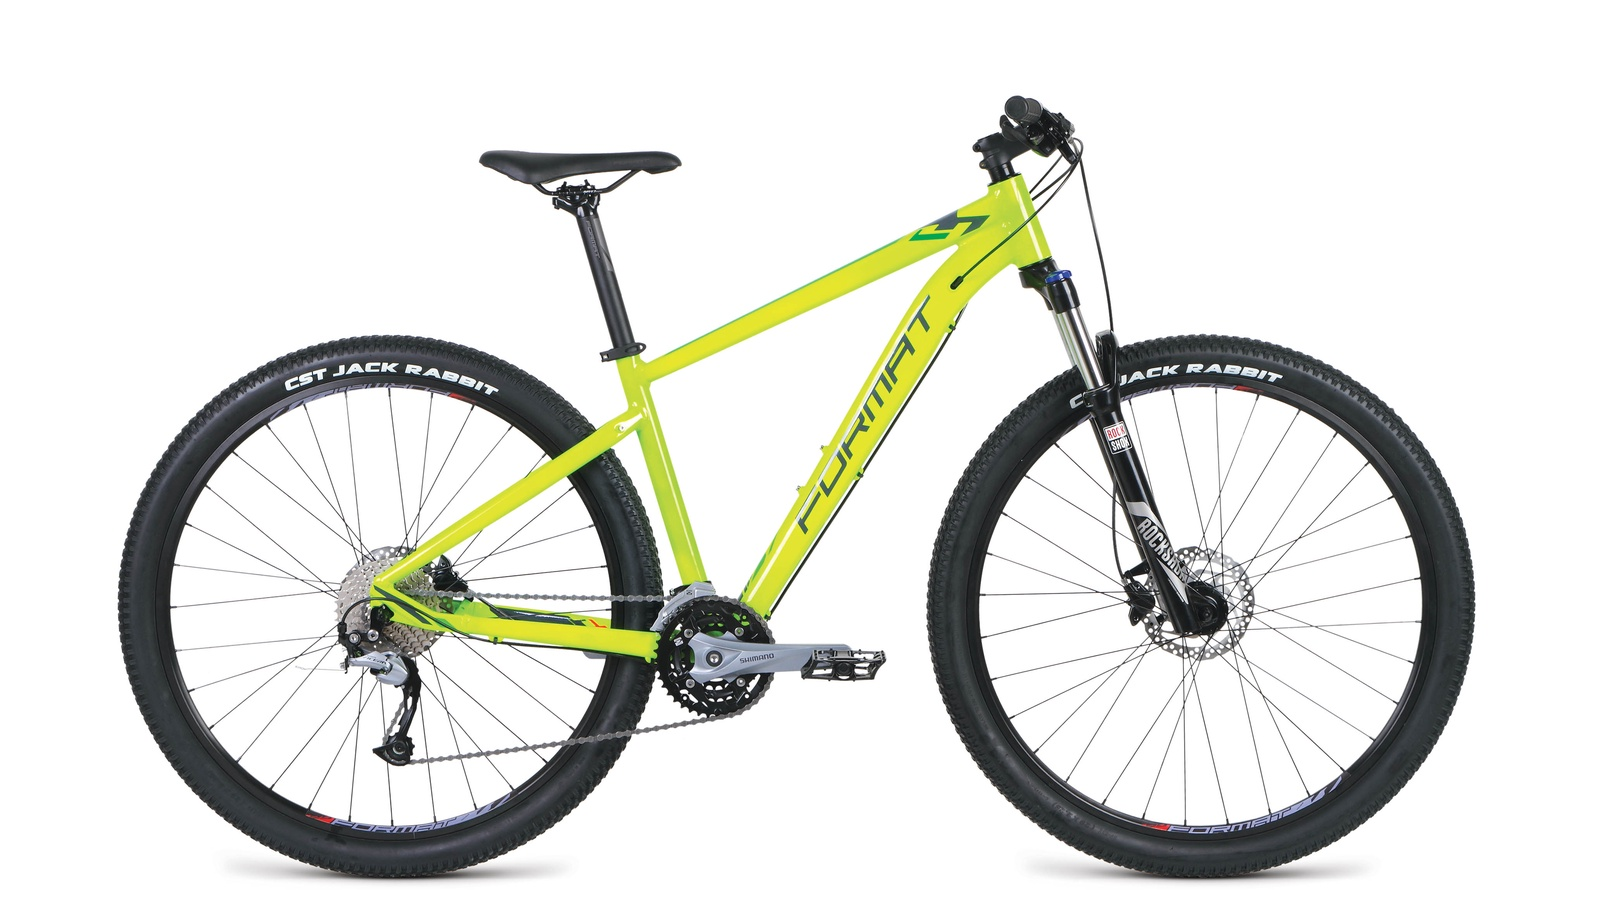 цена на Велосипед Format RBKM9M69S009, желтый